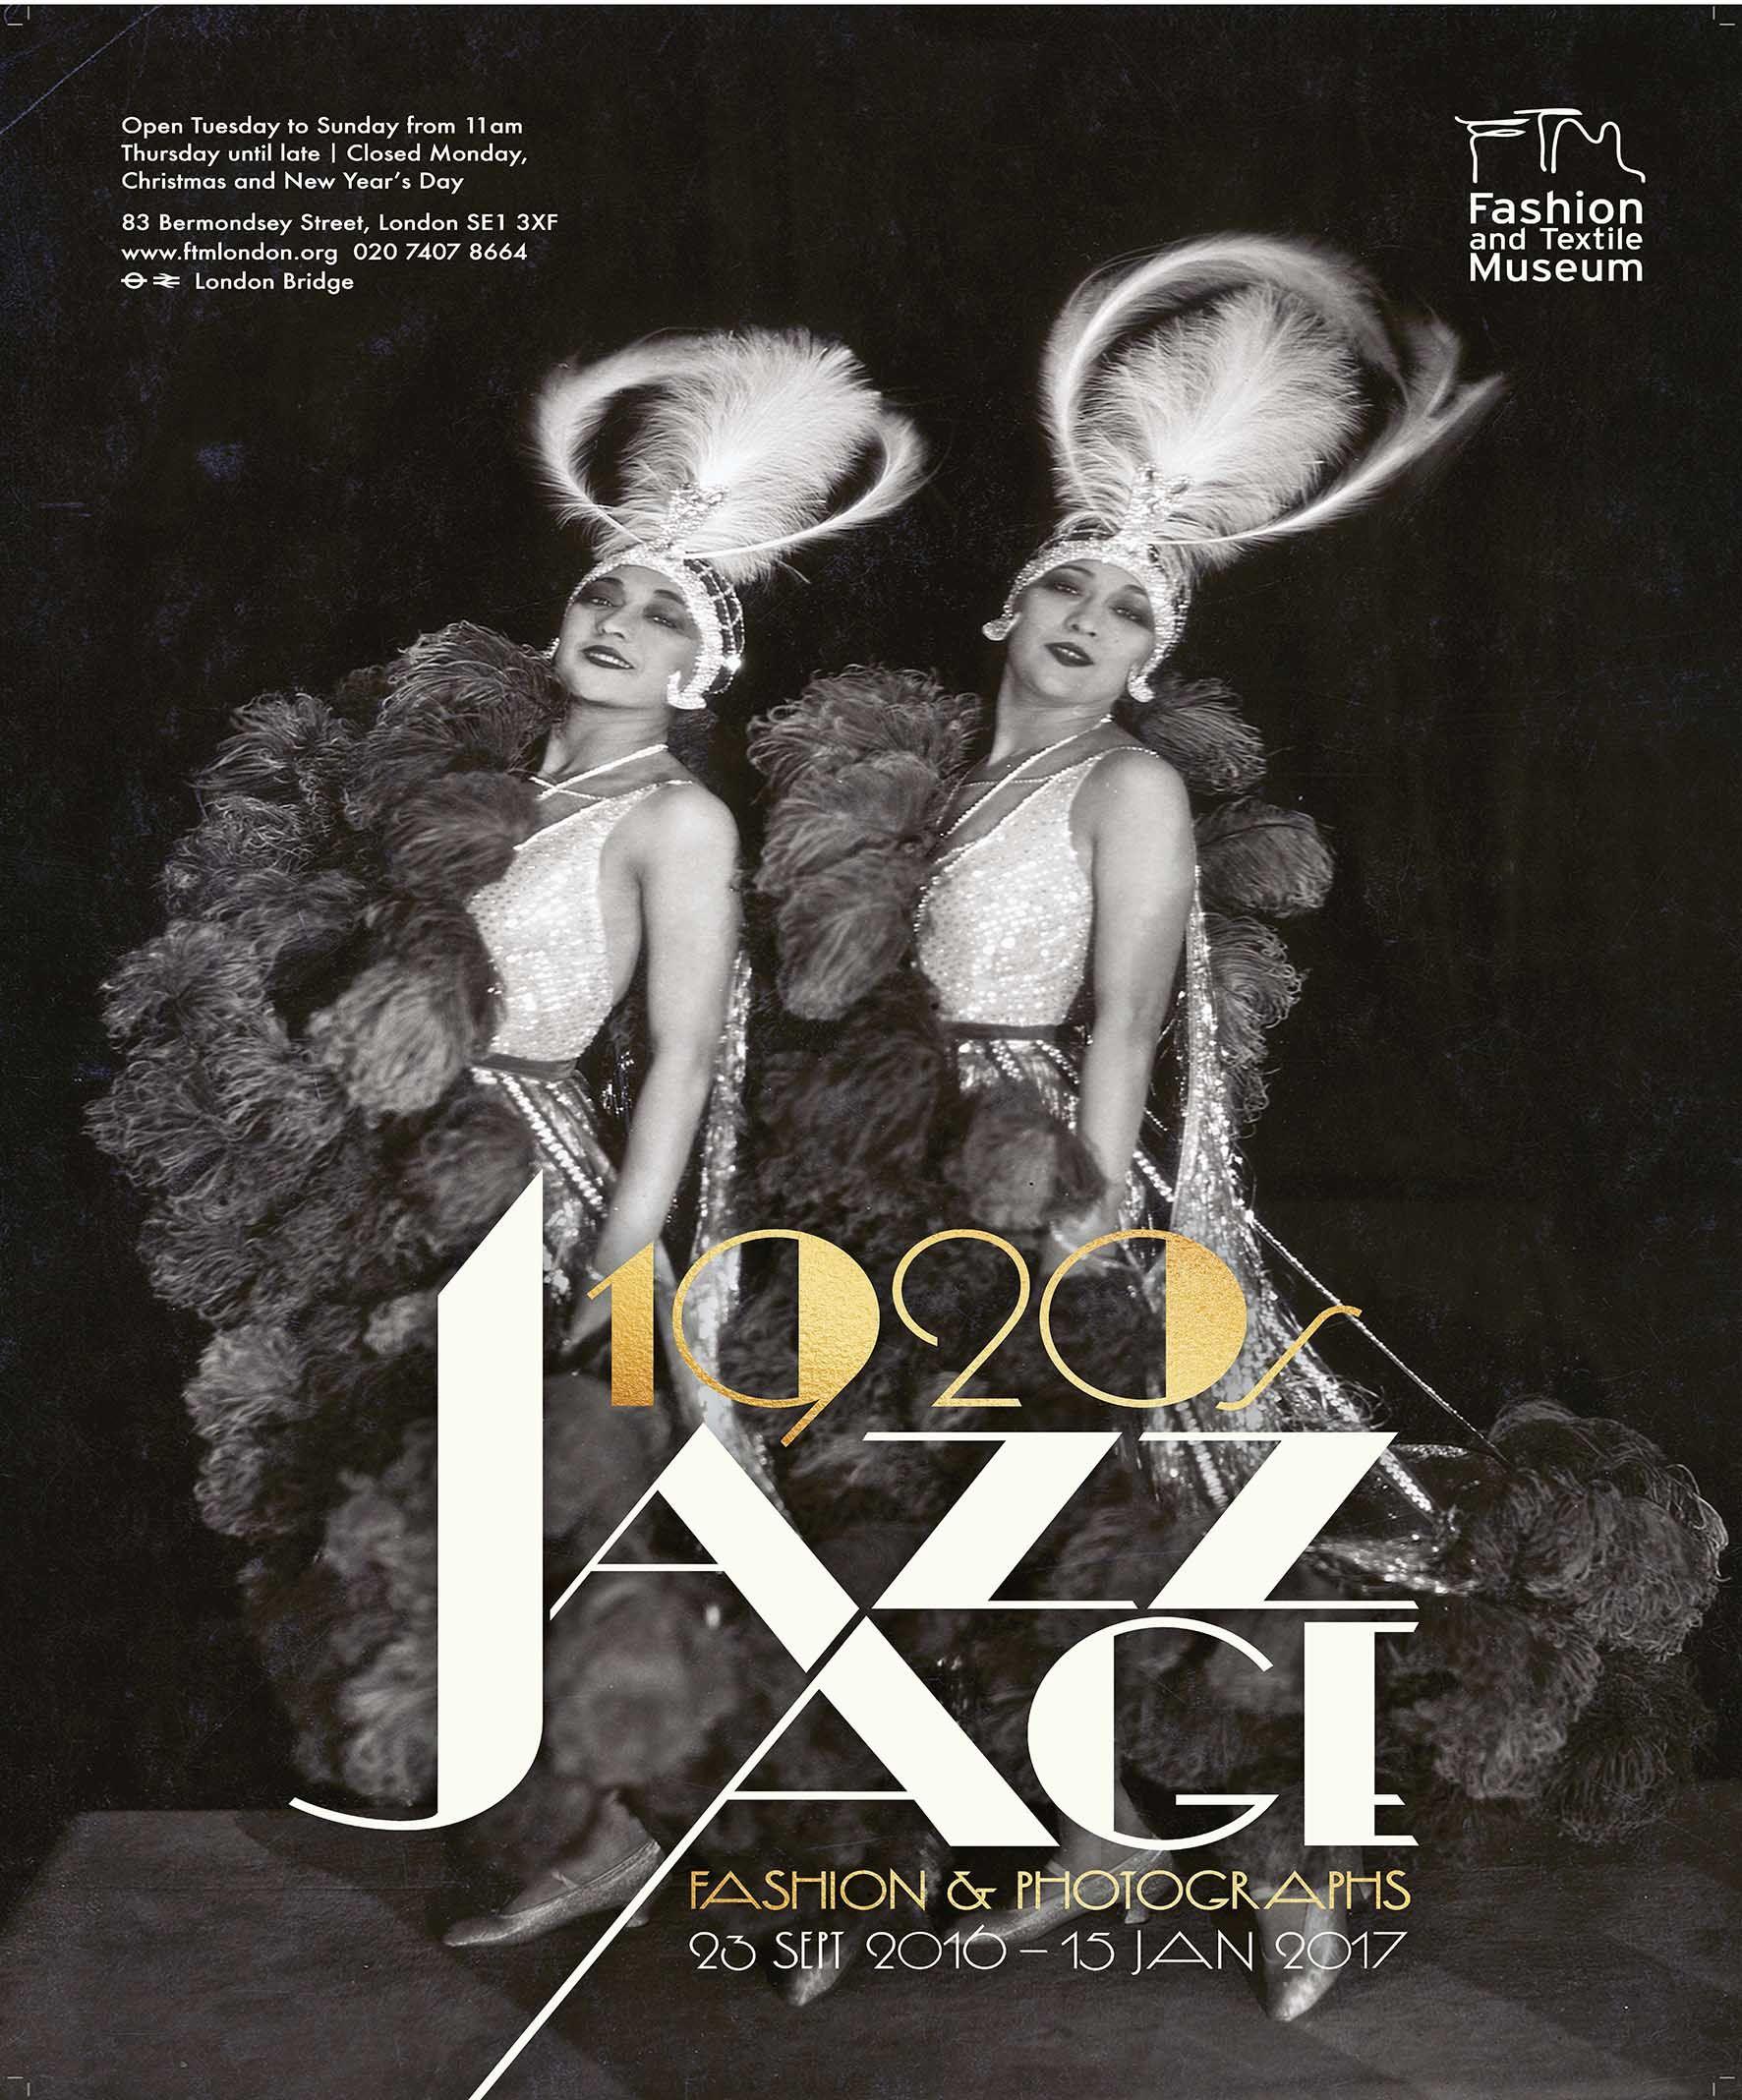 S Jazz Age Fashion Amp Photographs Exhibition Poster